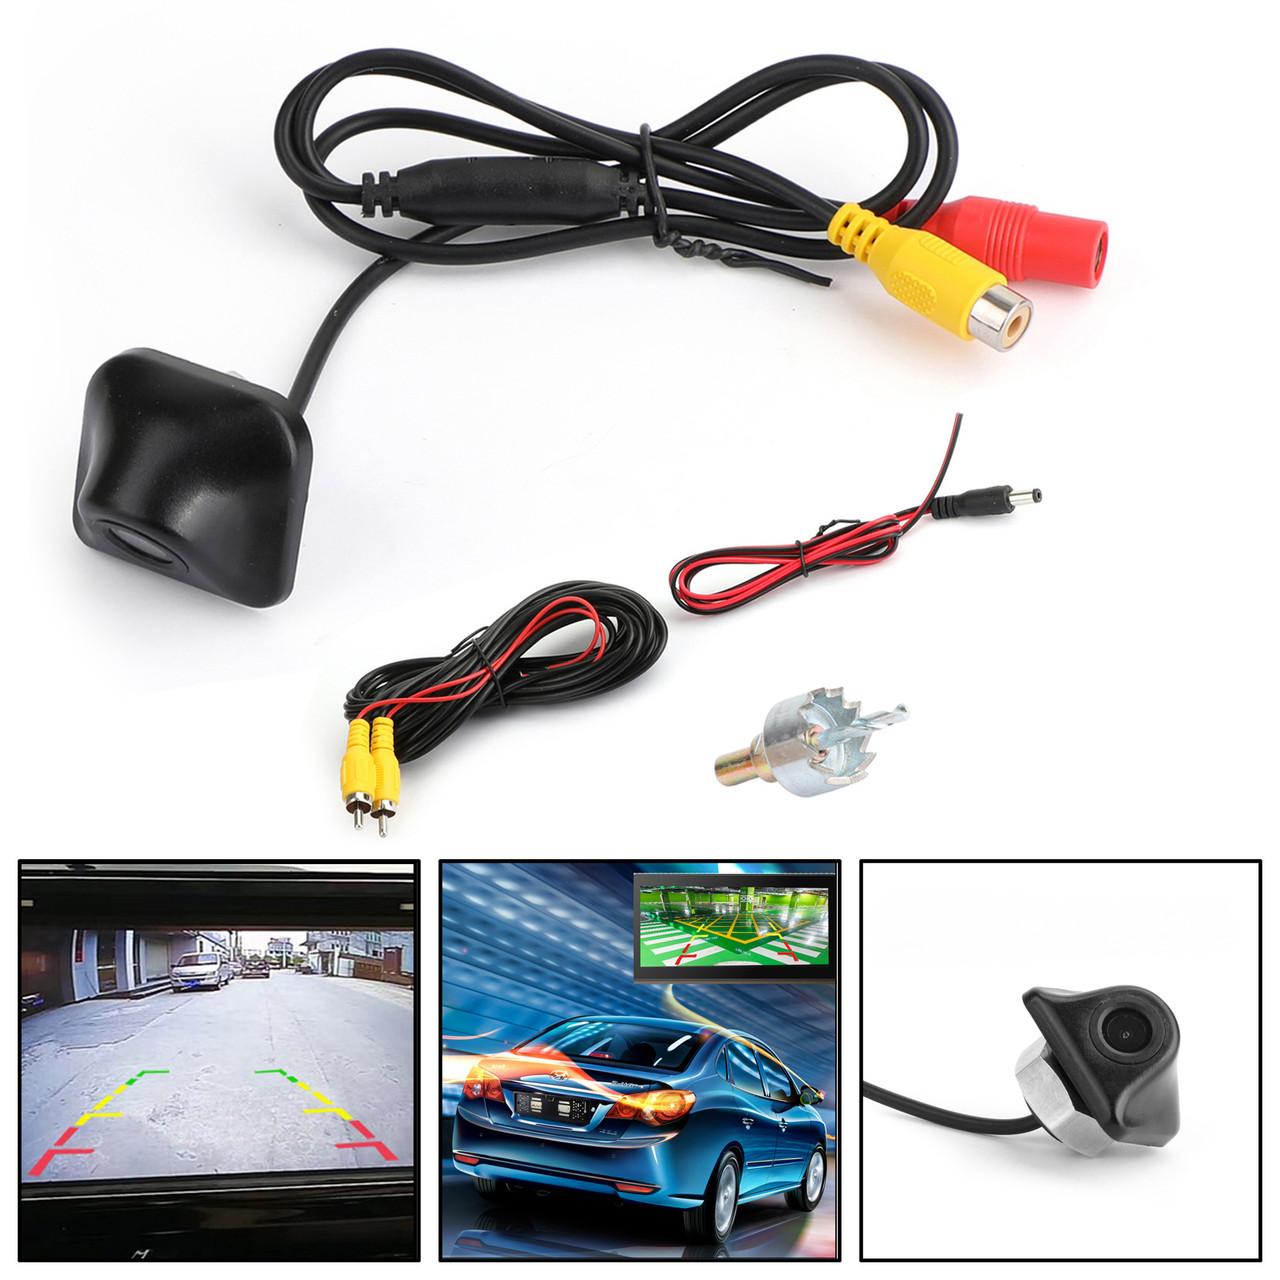 170°Anti Fog Waterproof Backup Night Vision Car Rear View Parking Camera Kit USA